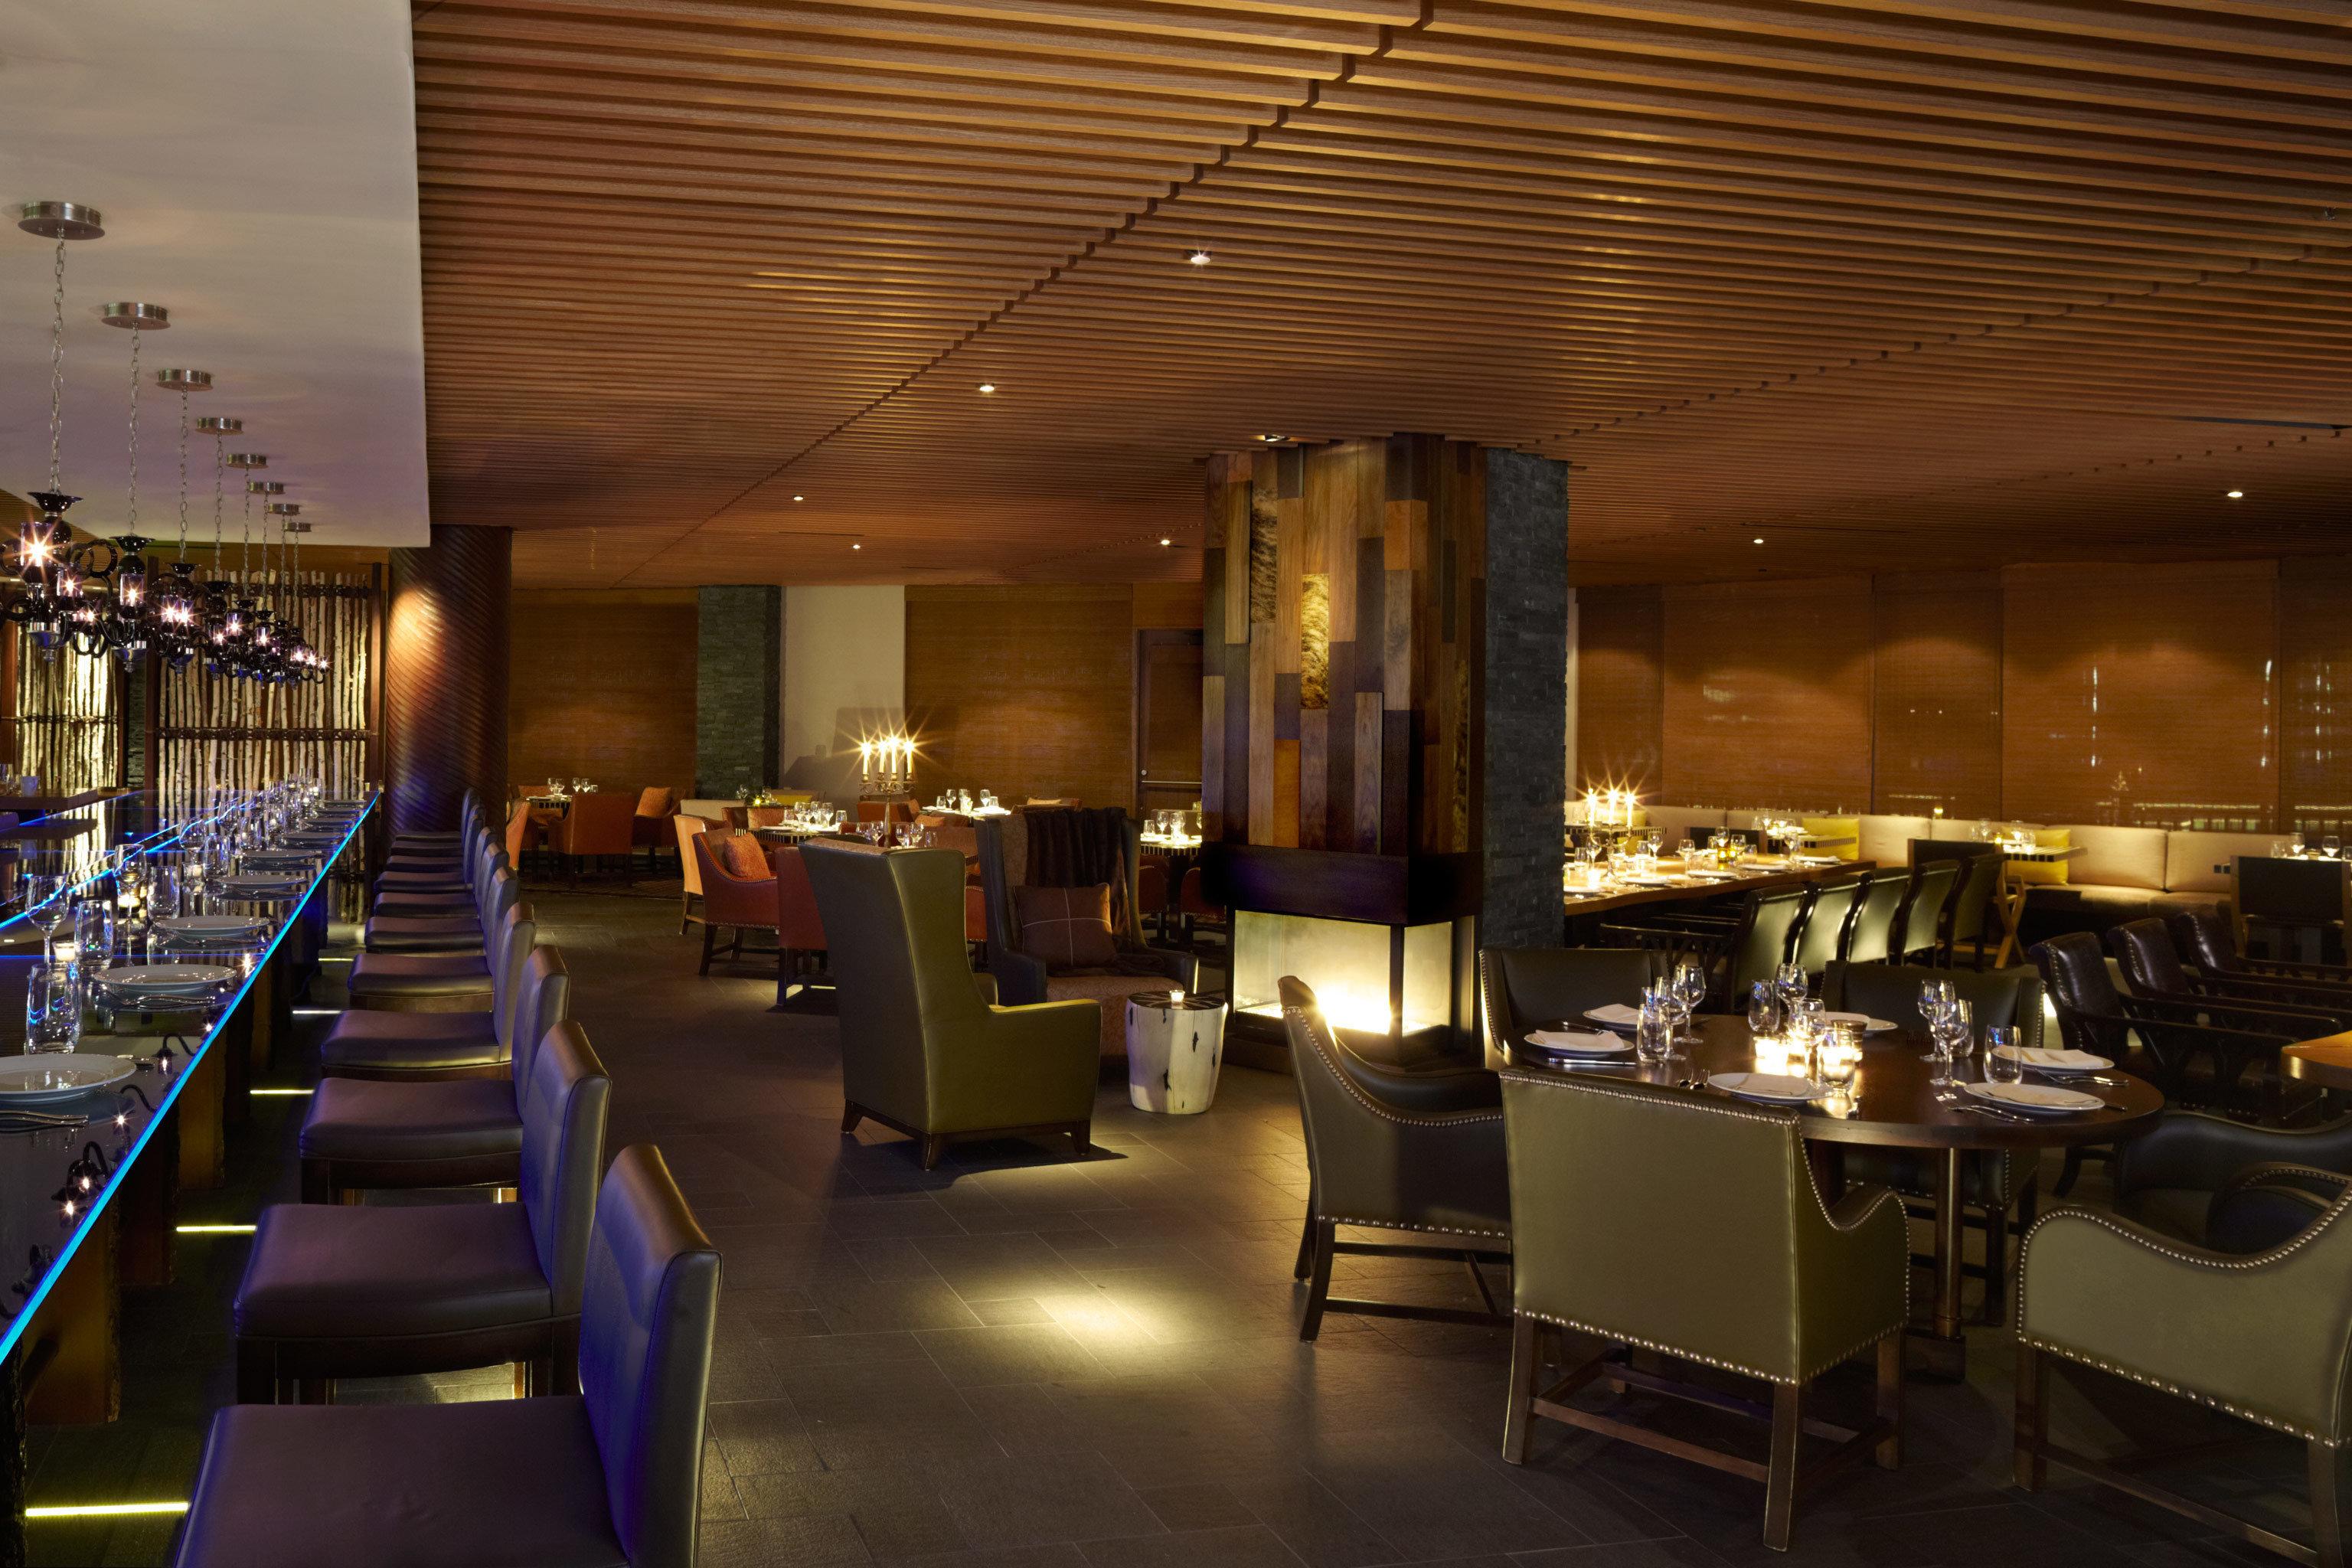 Lobby restaurant function hall lighting convention center Bar